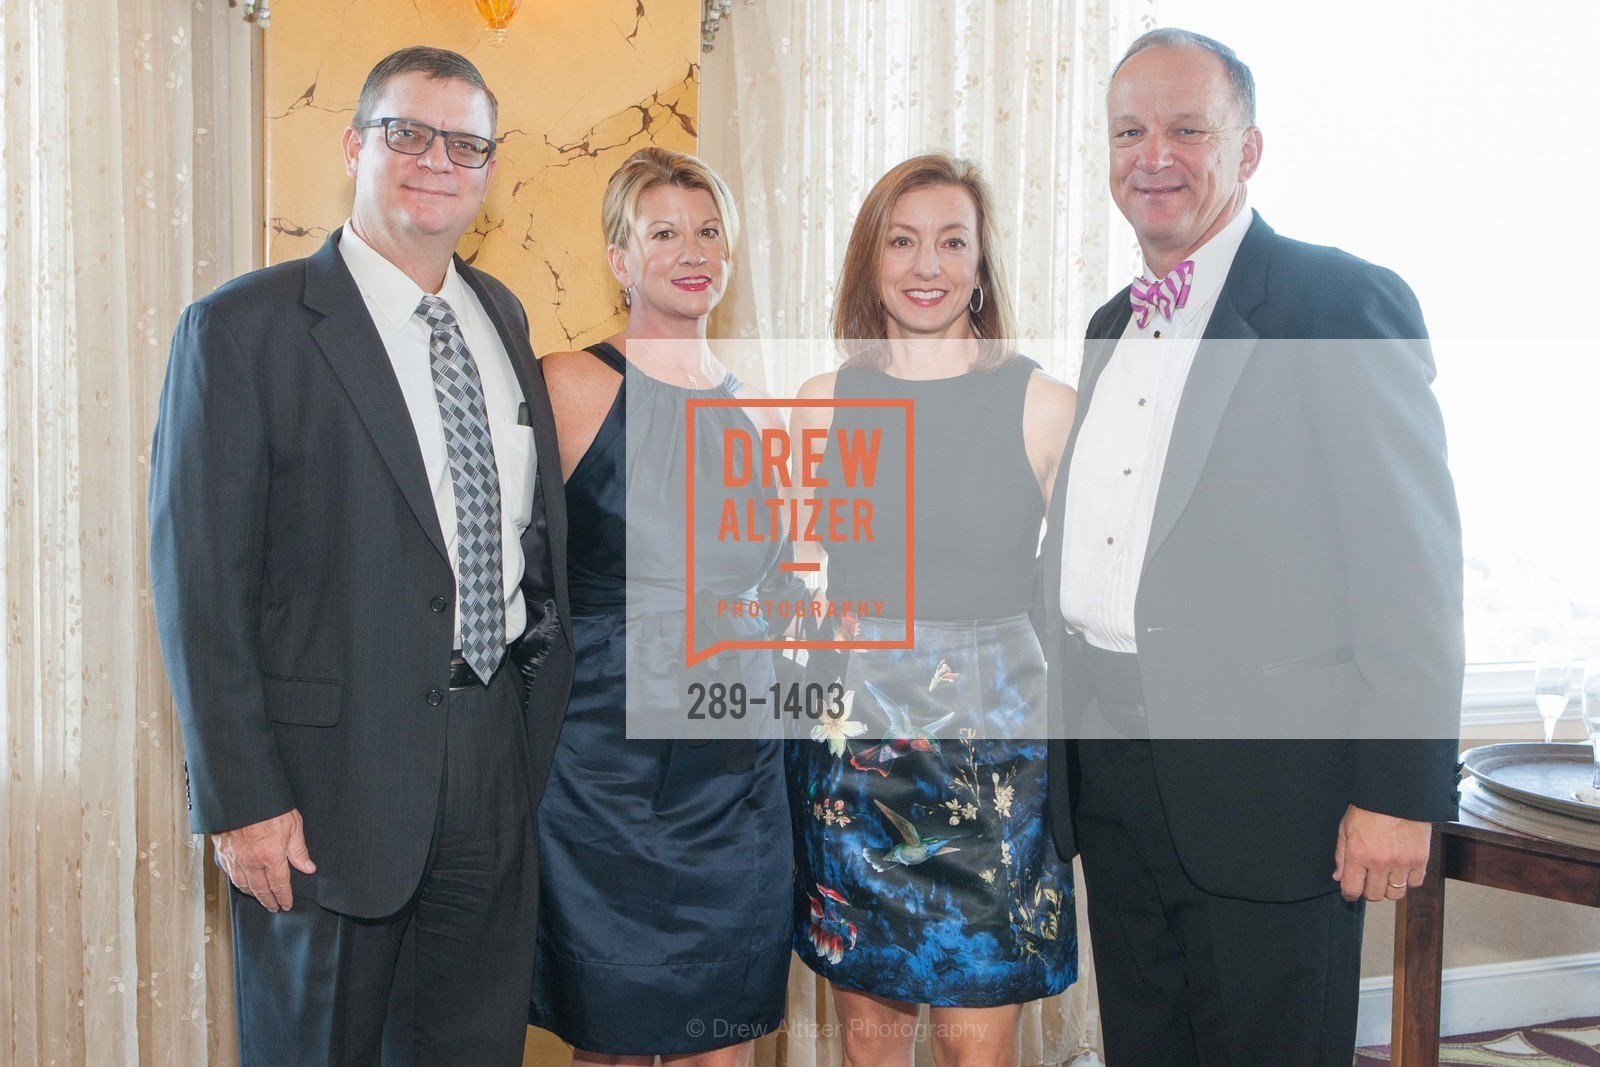 Brian Hale, Beth Hale, Carla Hultman, David Hultman, Photo #289-1403